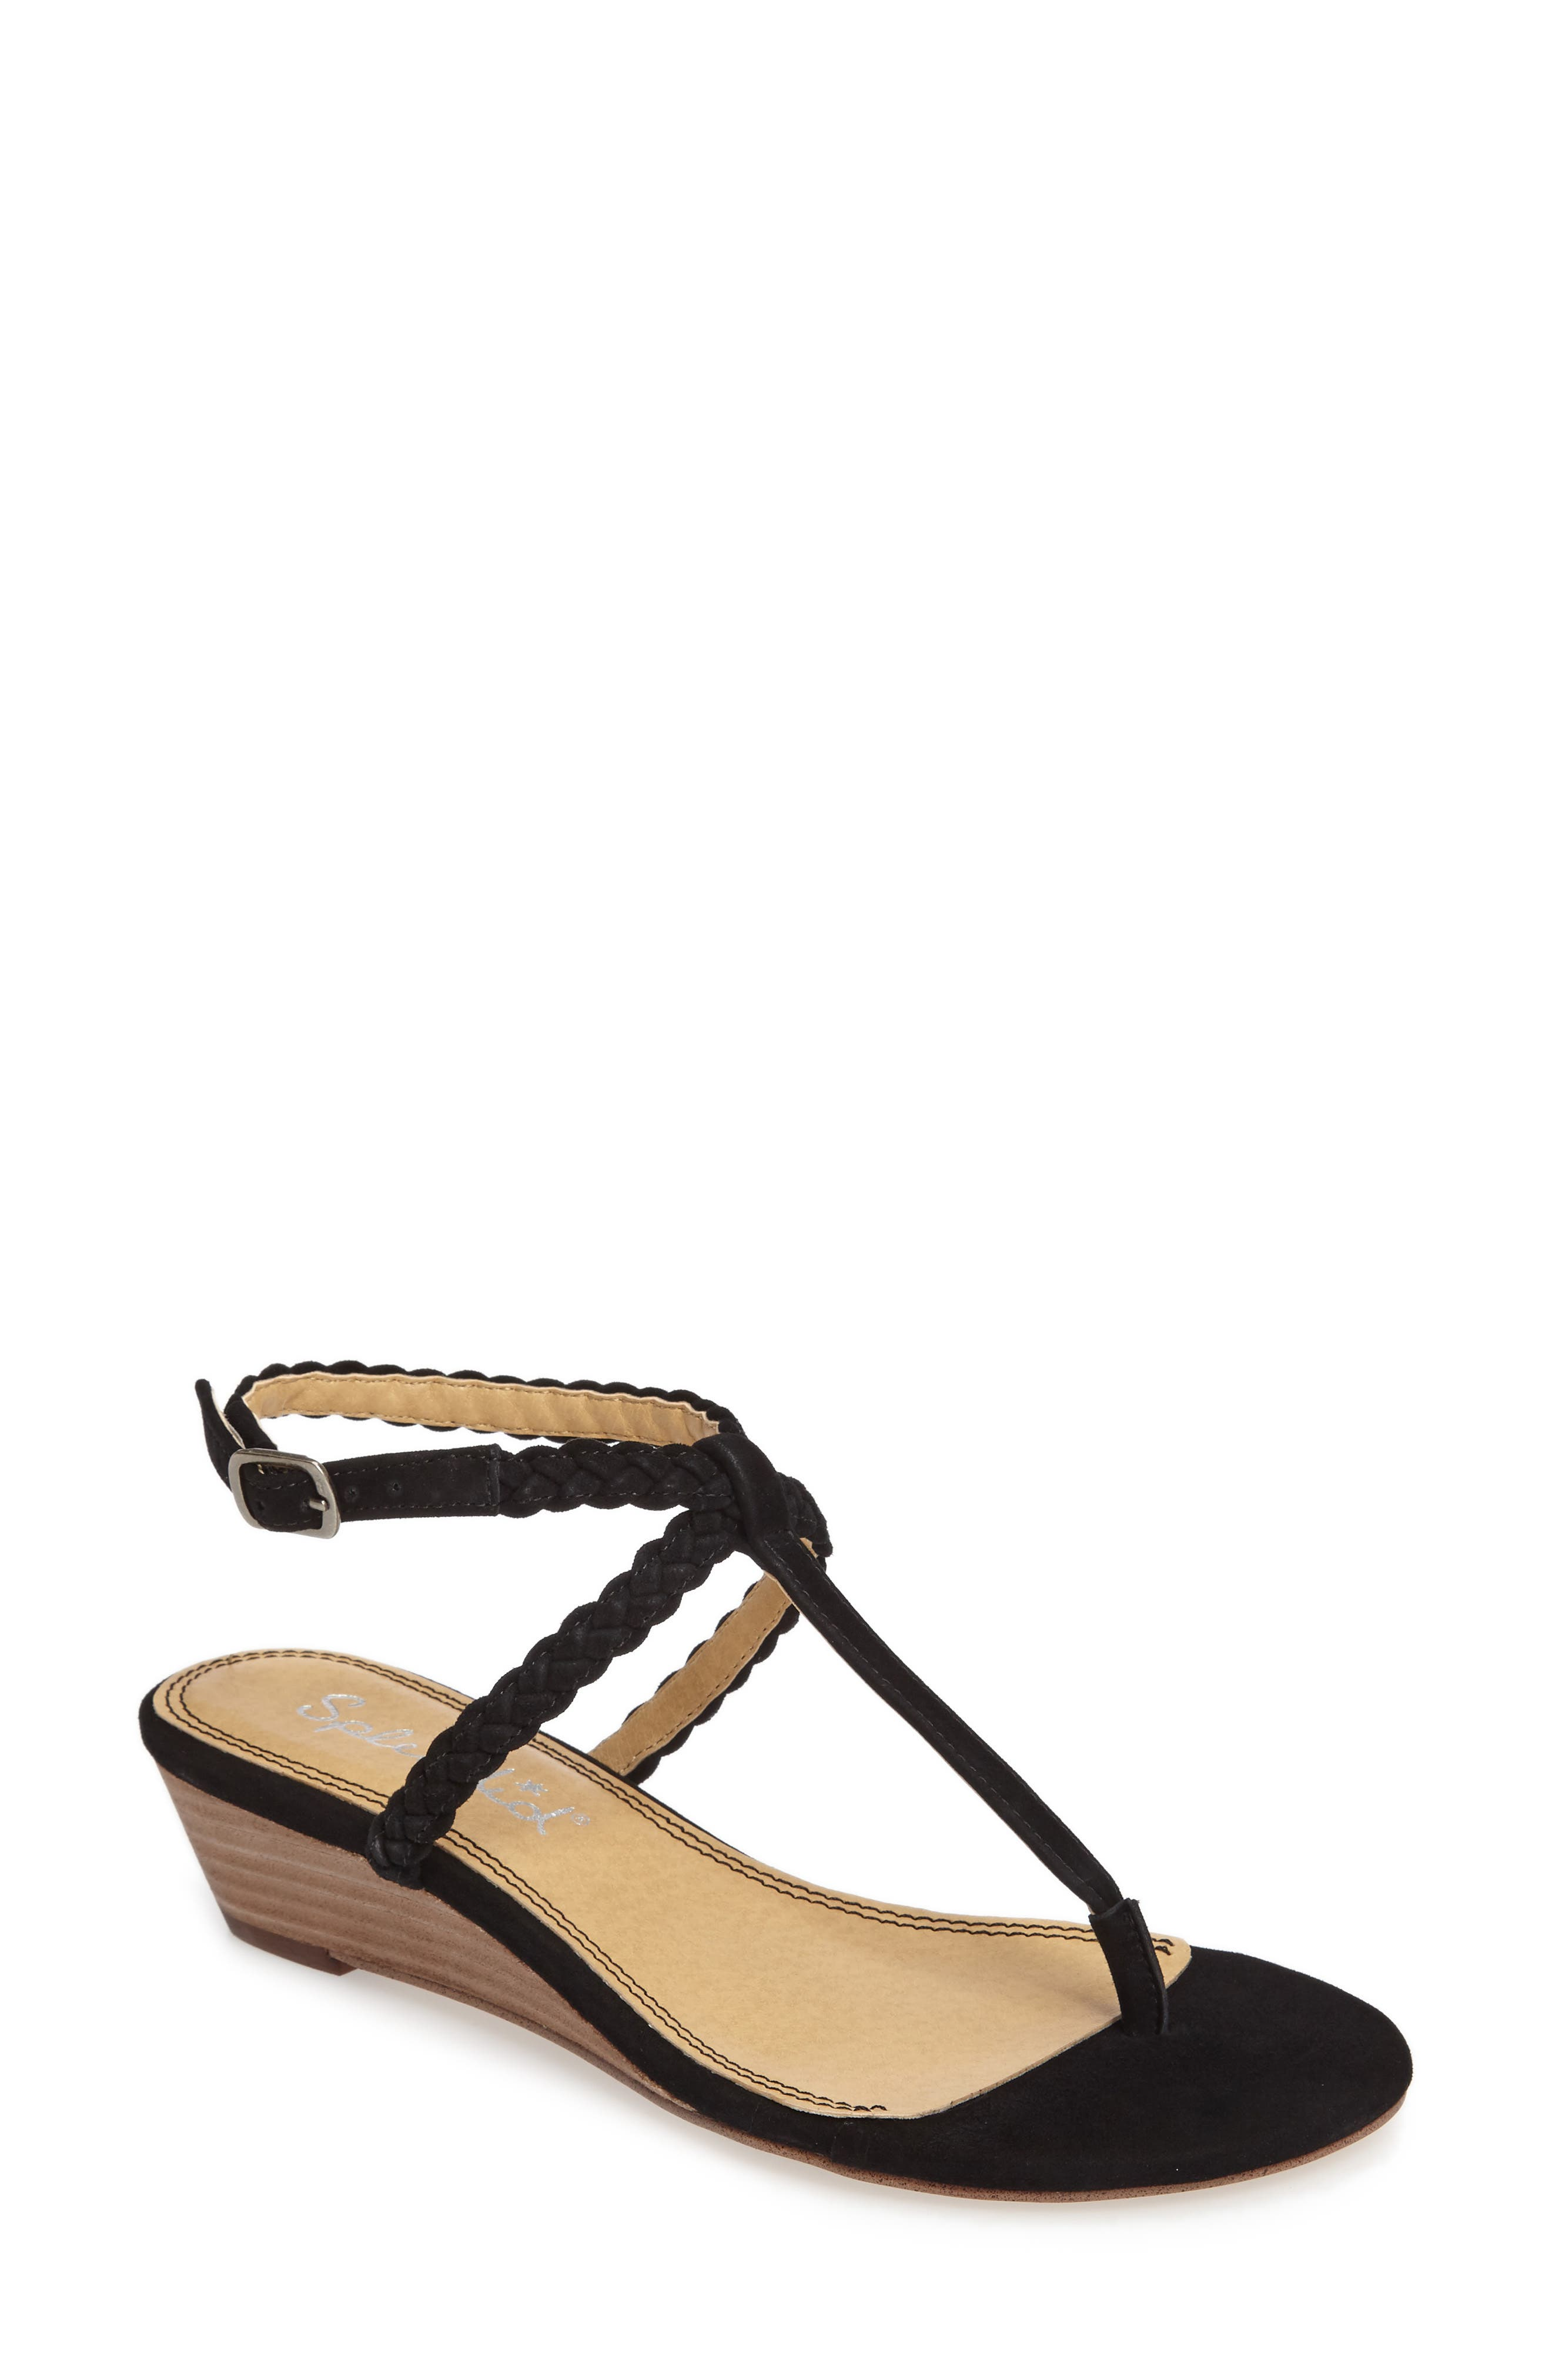 Jadia T-Strap Sandal,                             Main thumbnail 1, color,                             Black Suede